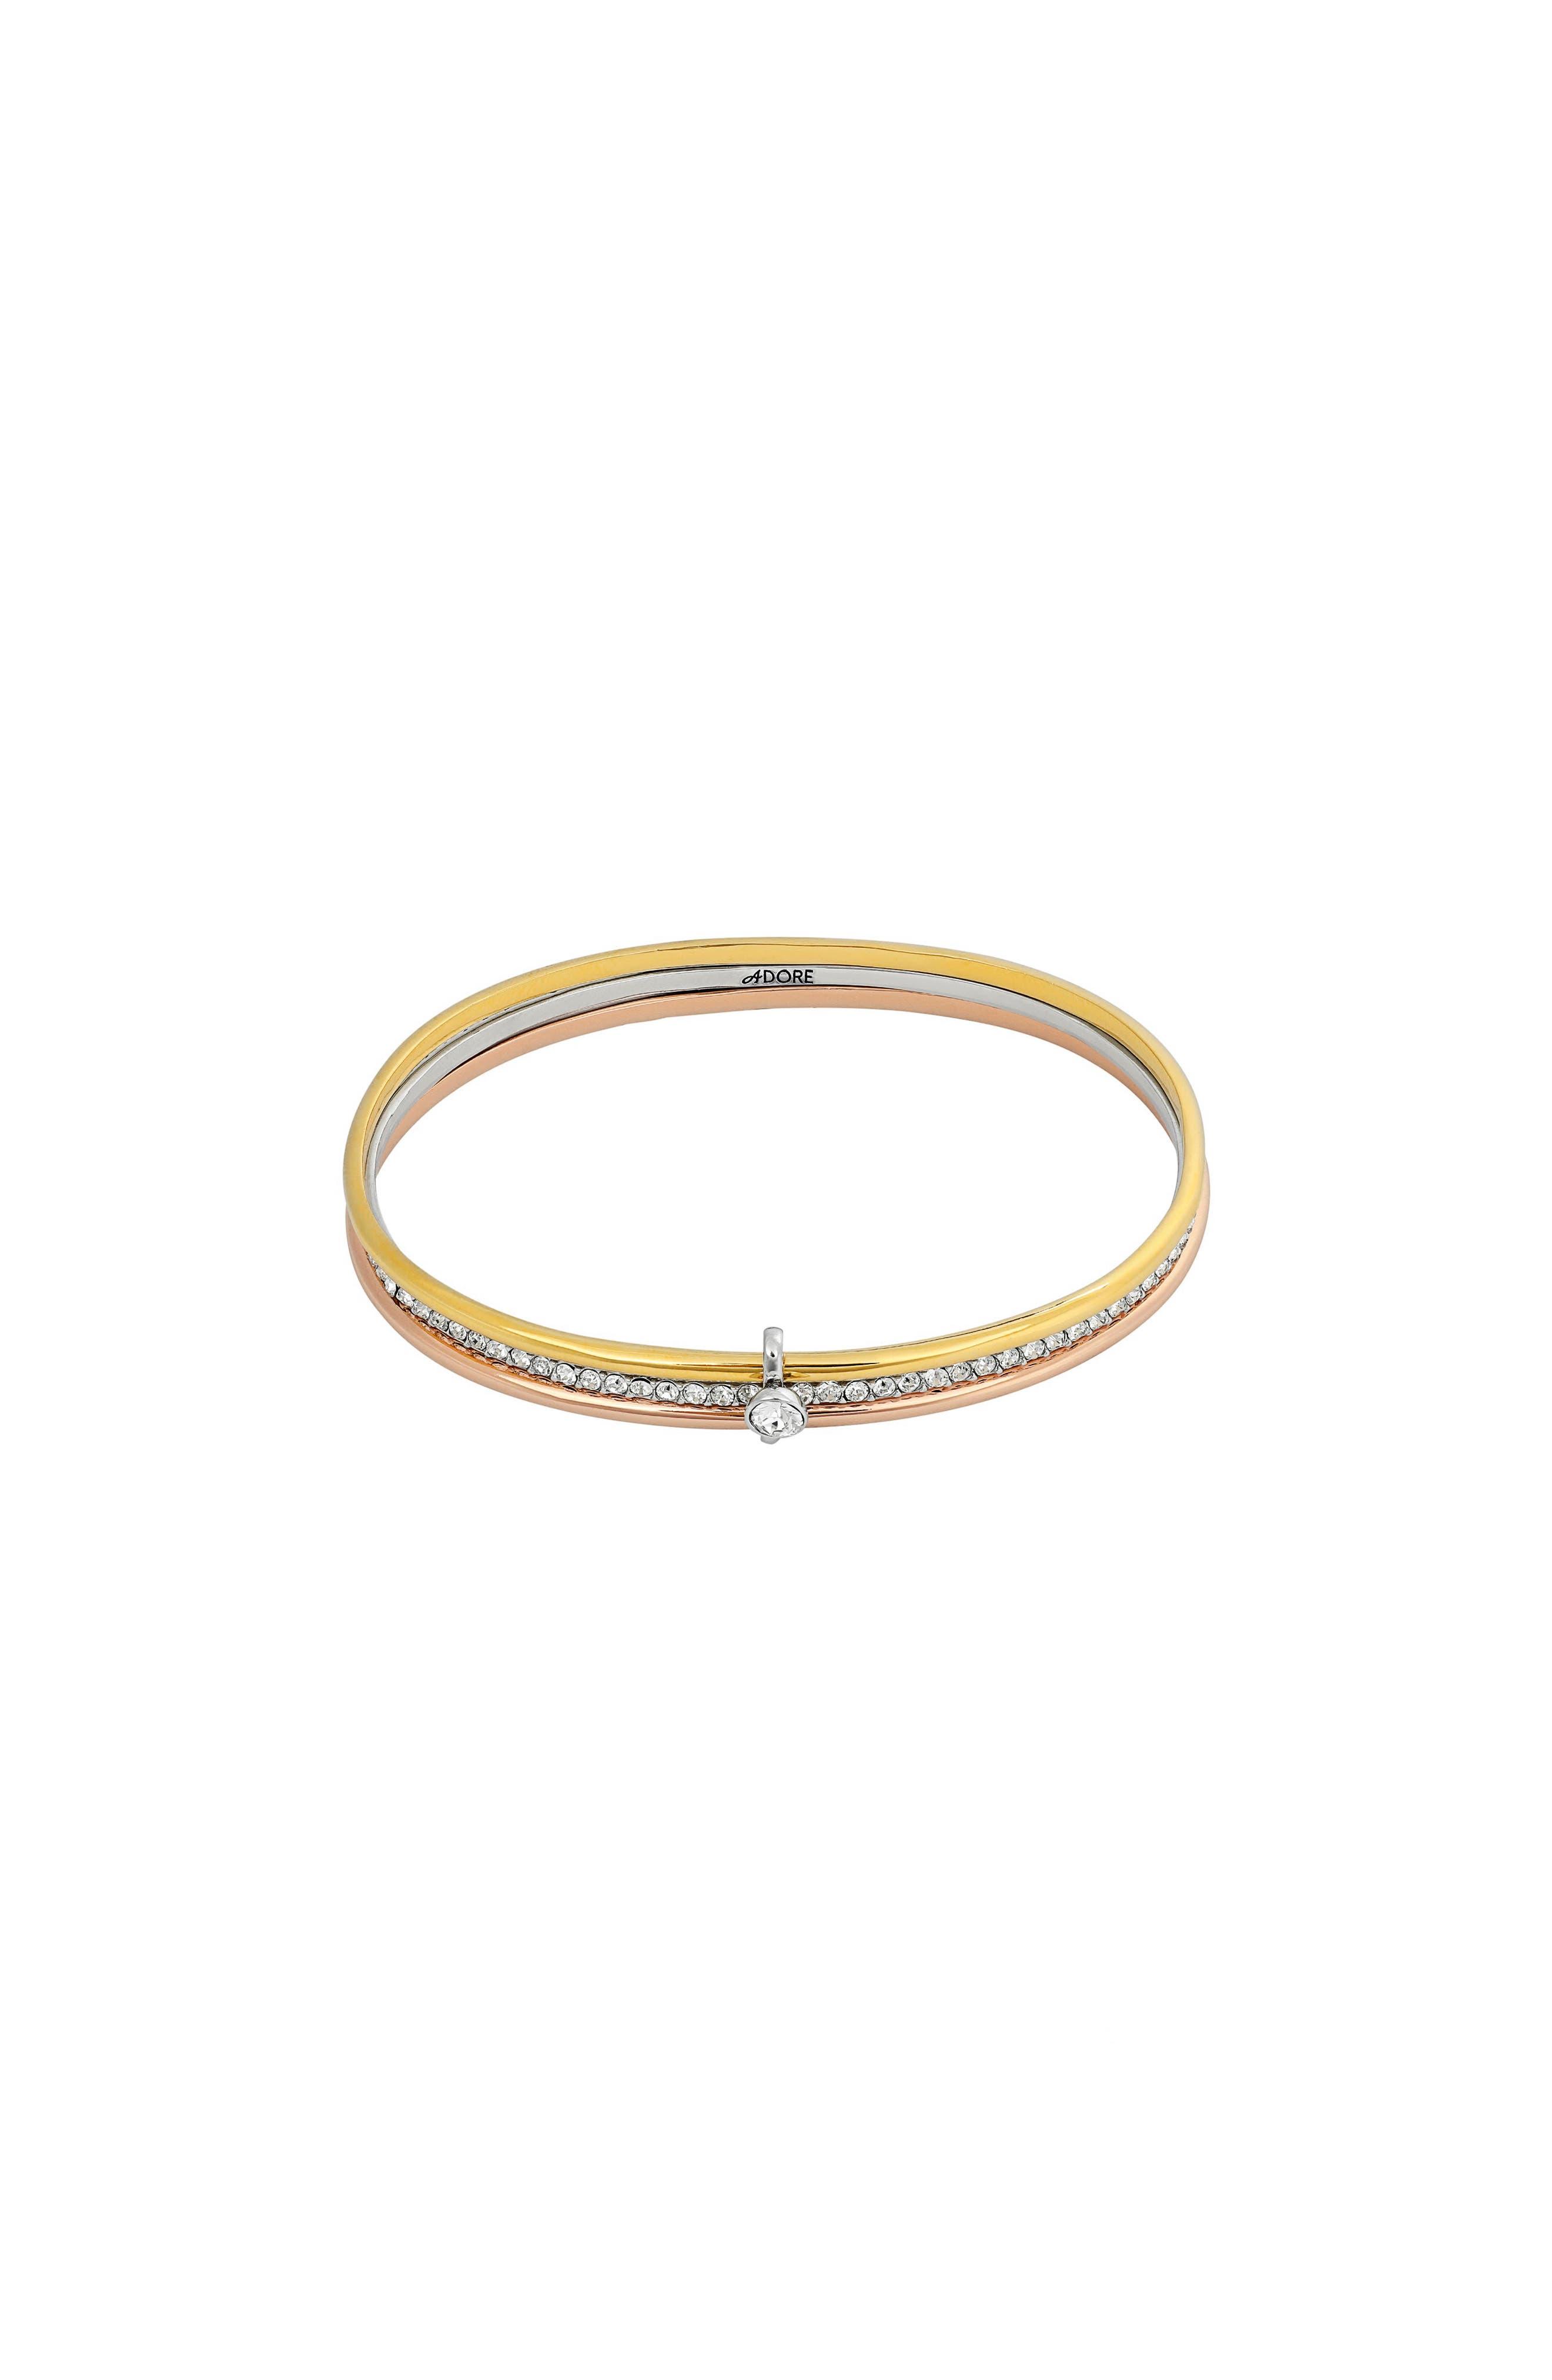 ADORE Interlocking Ring Bangle Trio Bracelet in Silver/ Gold/ Rose Gold